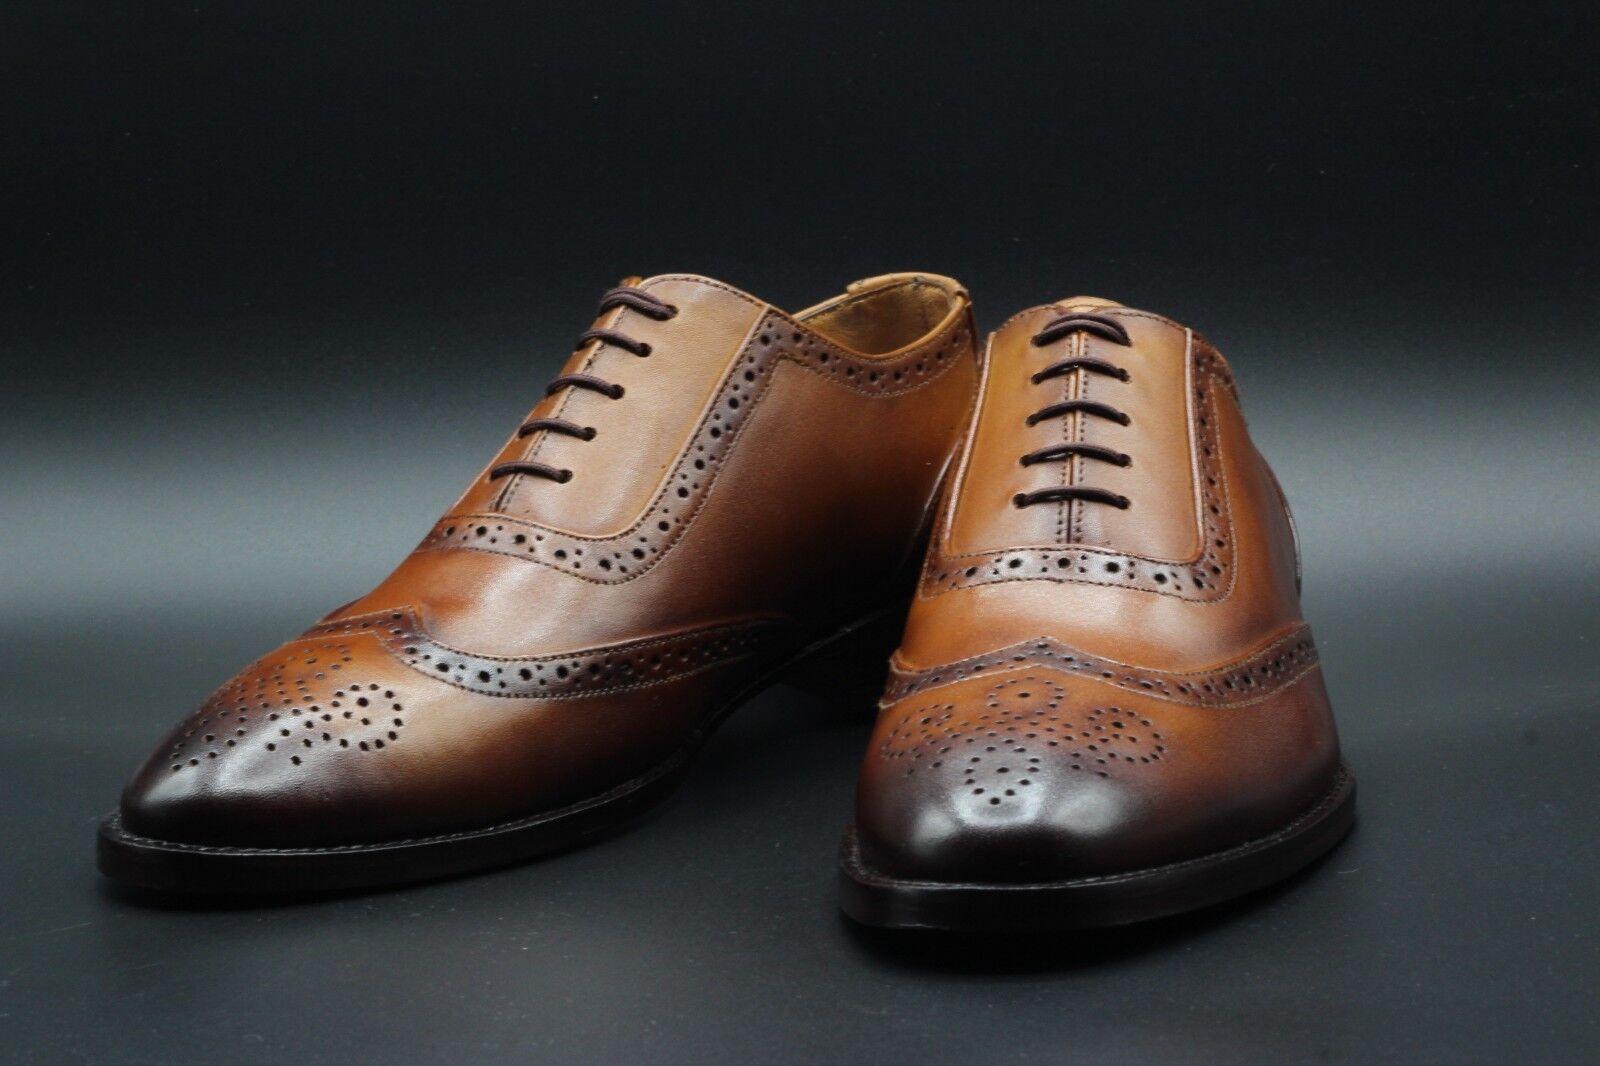 Men Bespoke Handmade Genuine Tan Leather Lace-Up Oxford Brogue Wingtip schuhe